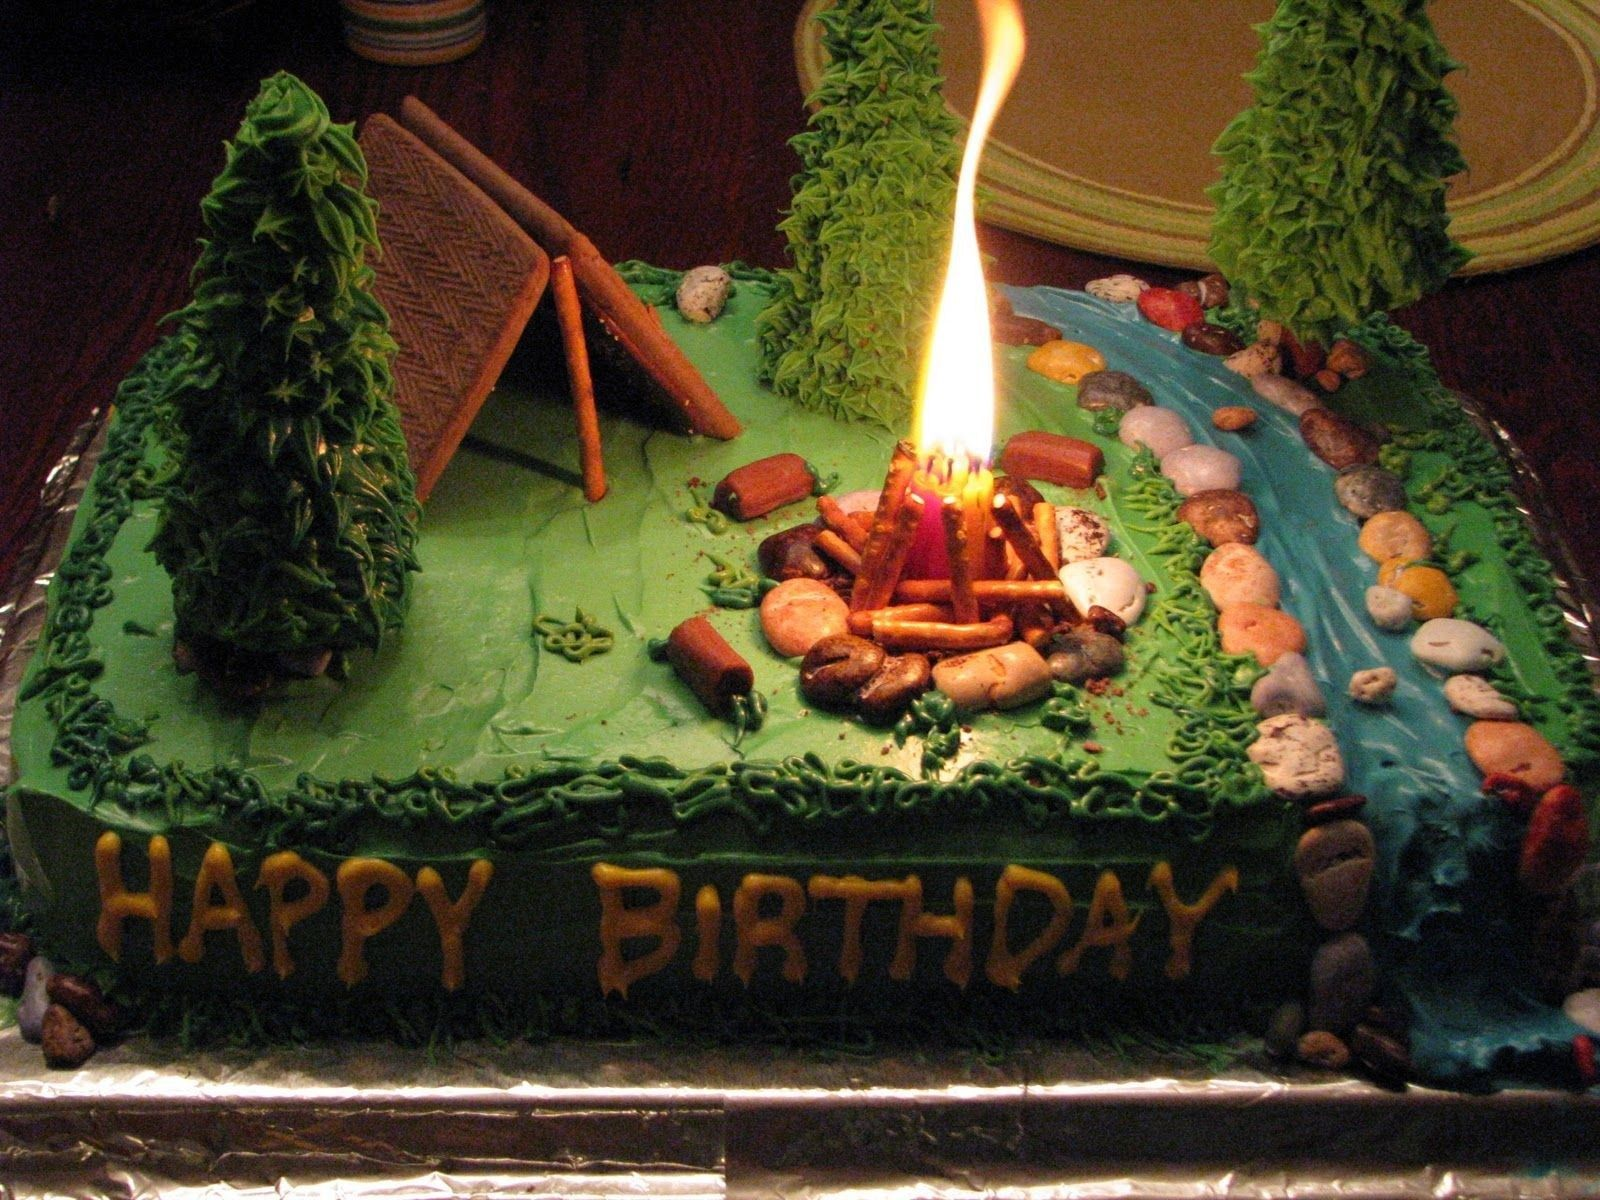 Camping Geburtstagstorte Camping Motto Kuchen Cupcakes Kekse Sara Camping Cakes   – Themed cakes